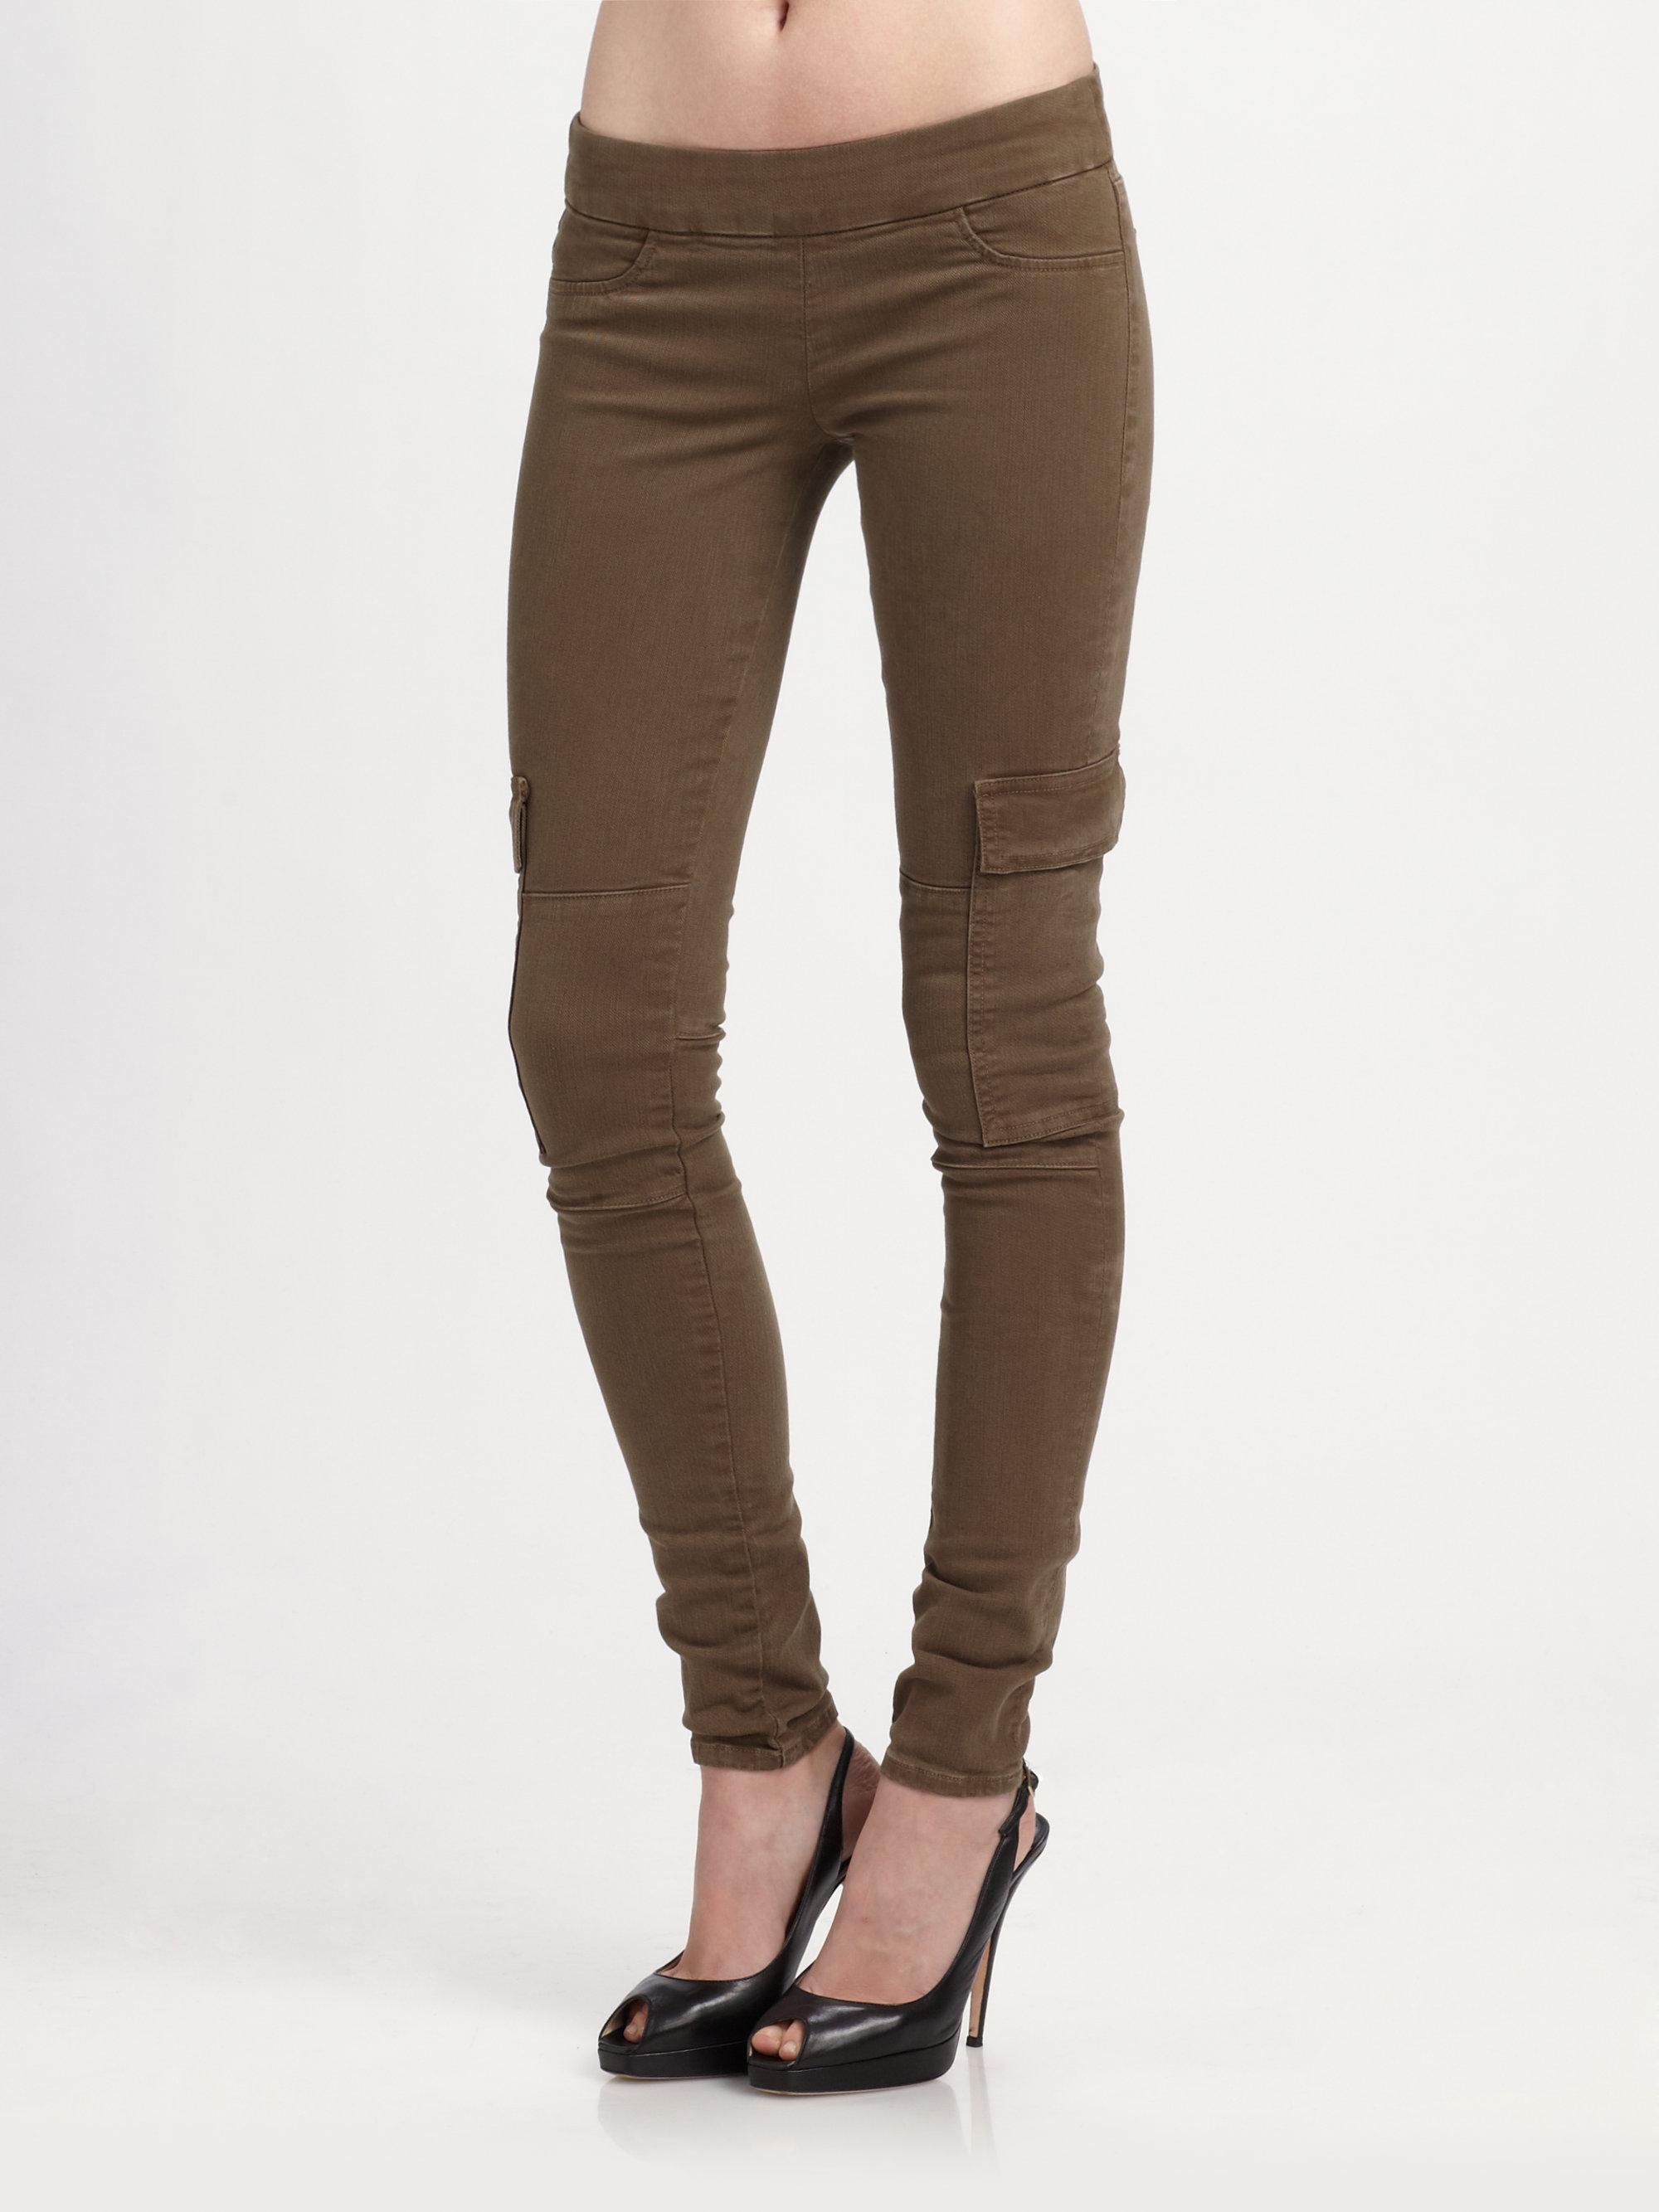 Hudson jeans Cargo Skinny Pants in Green | Lyst